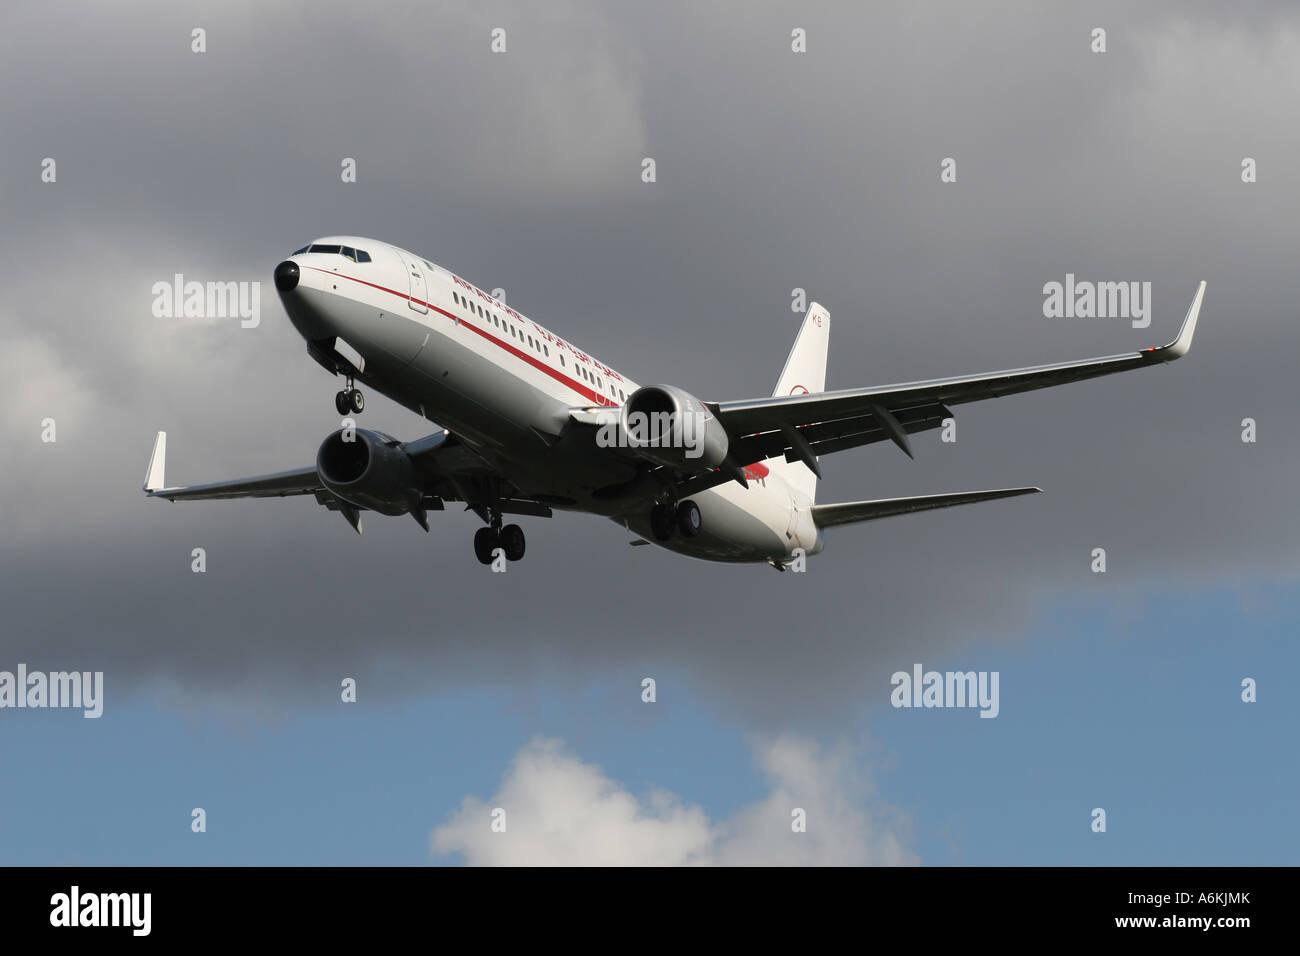 boeing-737-800-air-algerie-A6KJMK.jpg